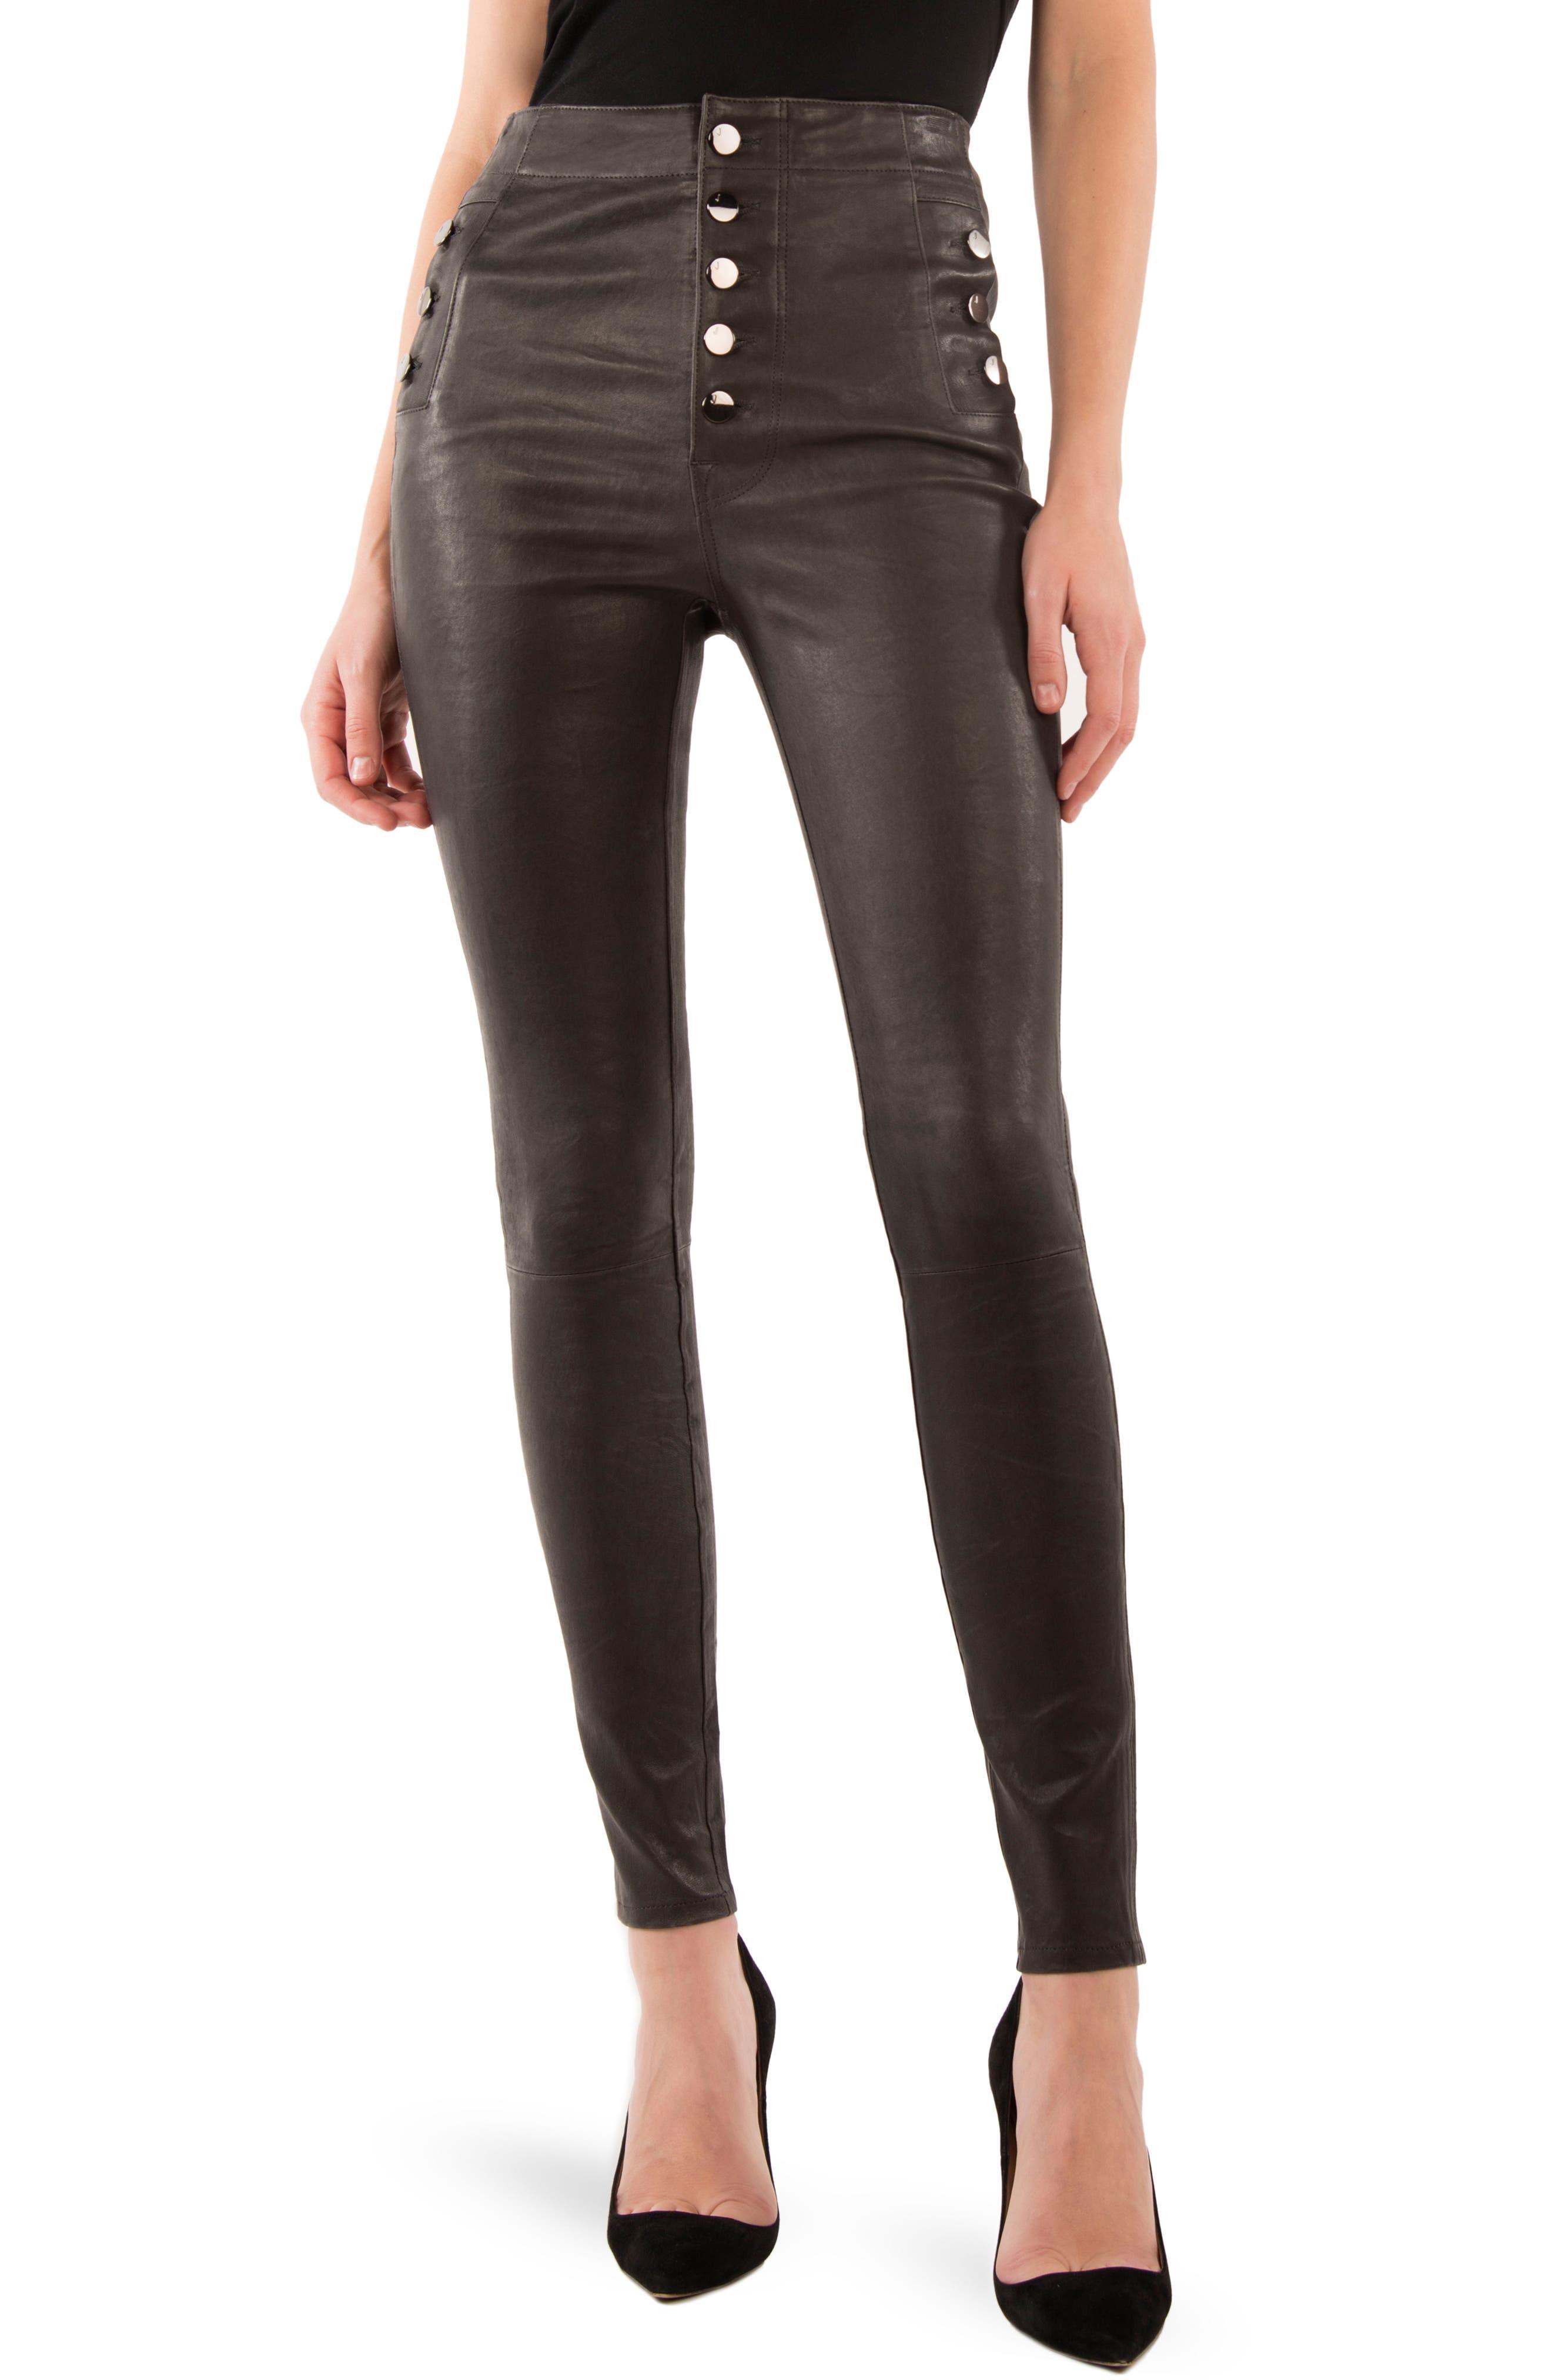 Natasha High Waist Skinny Leather Pants,                             Main thumbnail 1, color,                             039